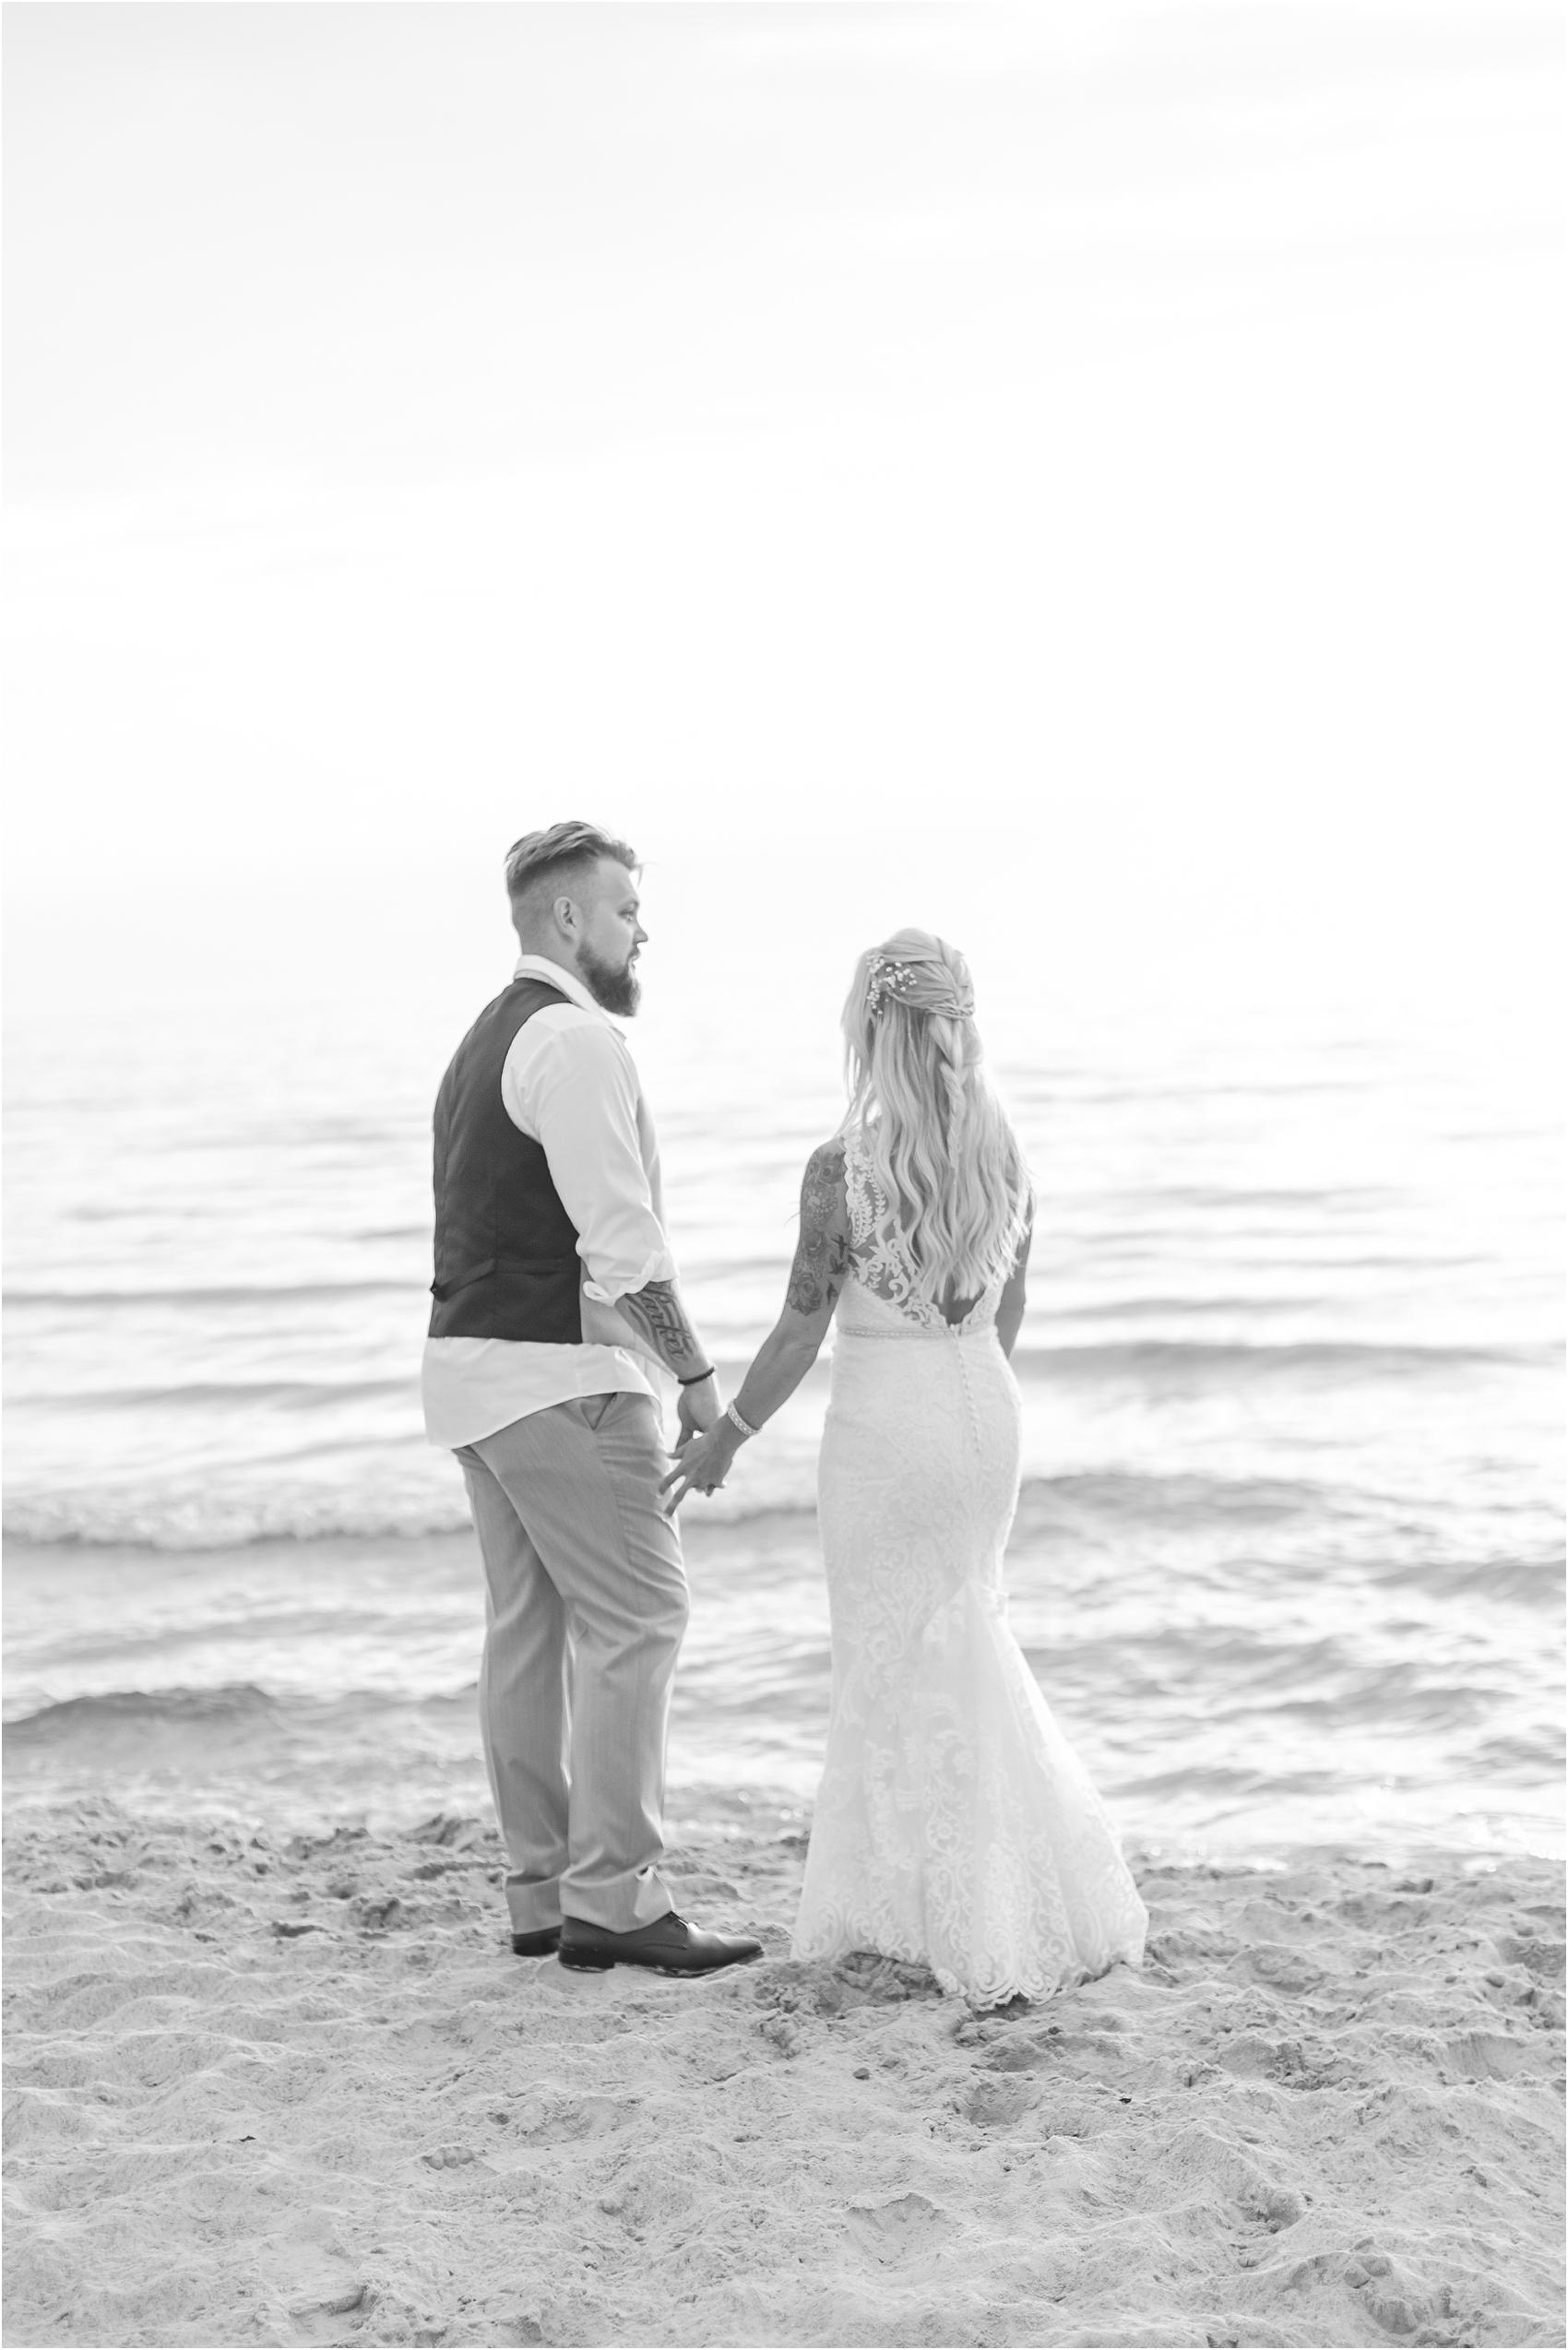 fun-whimsical-beach-wedding-photos-in-st-joseph-michigan-by-courtney-carolyn-photography_0101.jpg